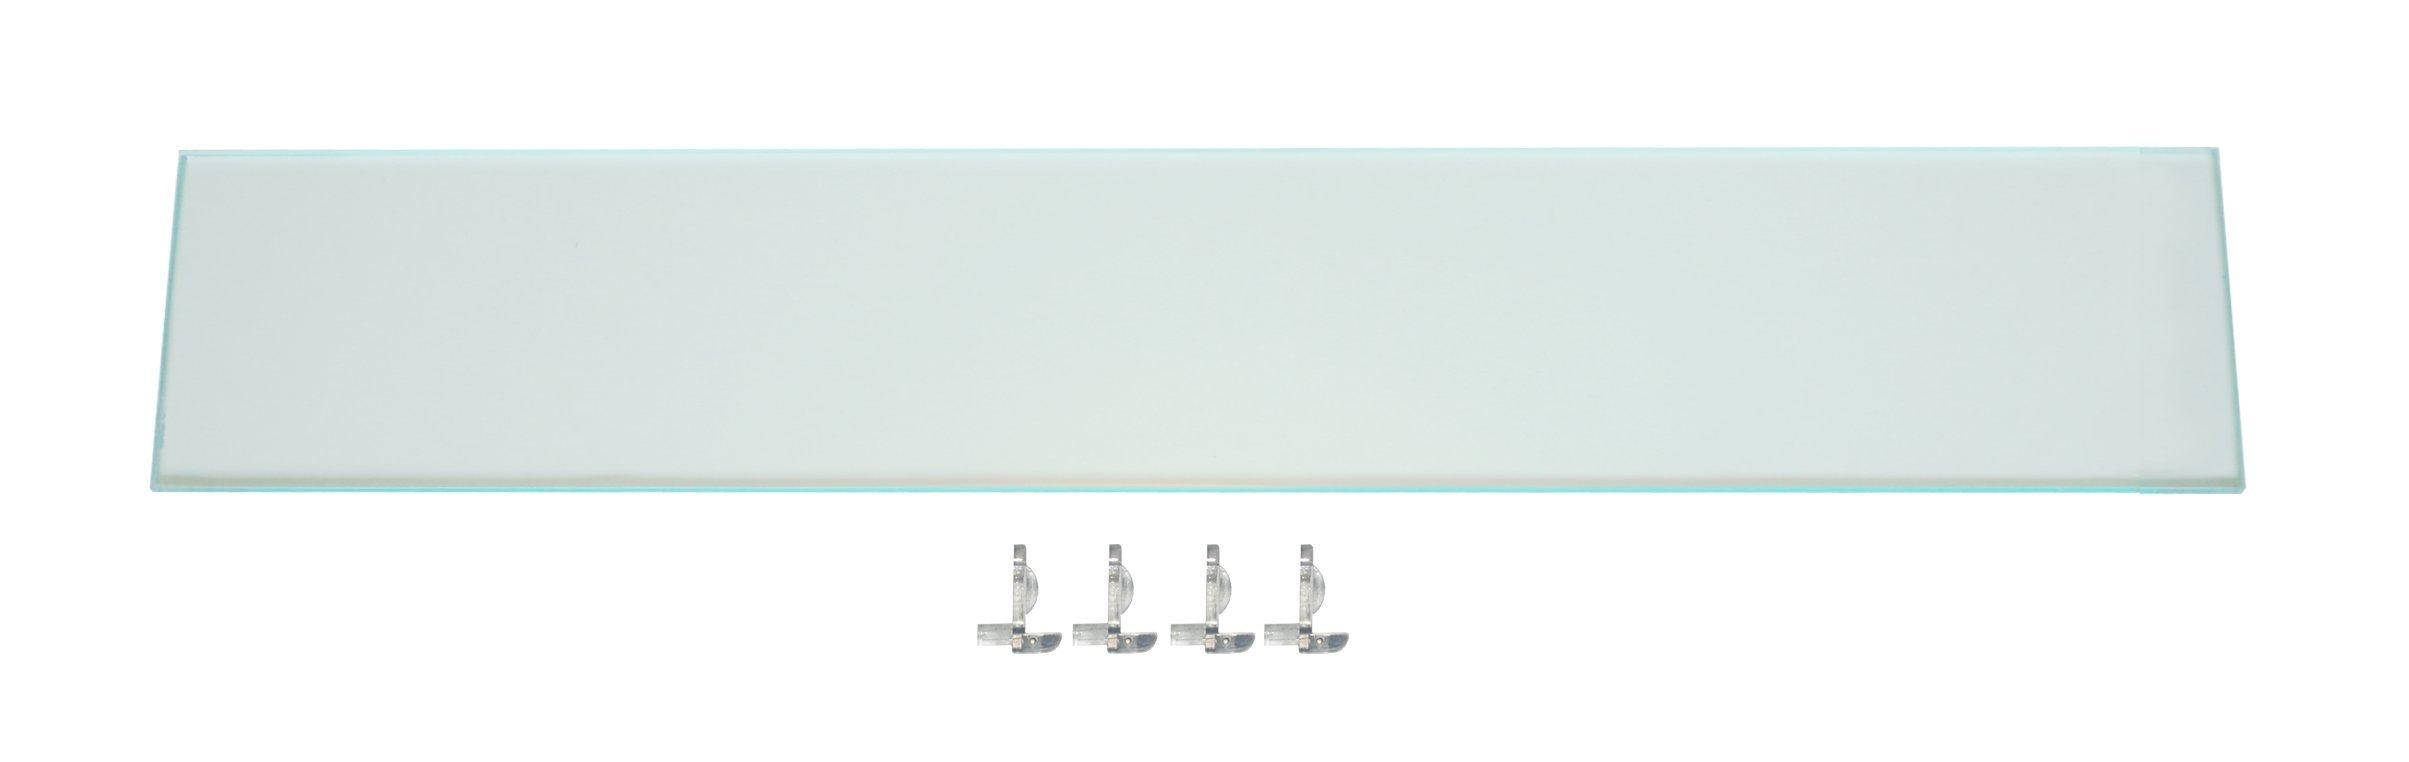 Medicine Cabinet Storage Shelf: Add Space or Replace Kohler Shelf- Complete w/Shelf Clips; Ocin Bathroom Toiletry Storage Shelf with Shatterproof Acrylic Plastic Design! (K15) by Ocin Designs